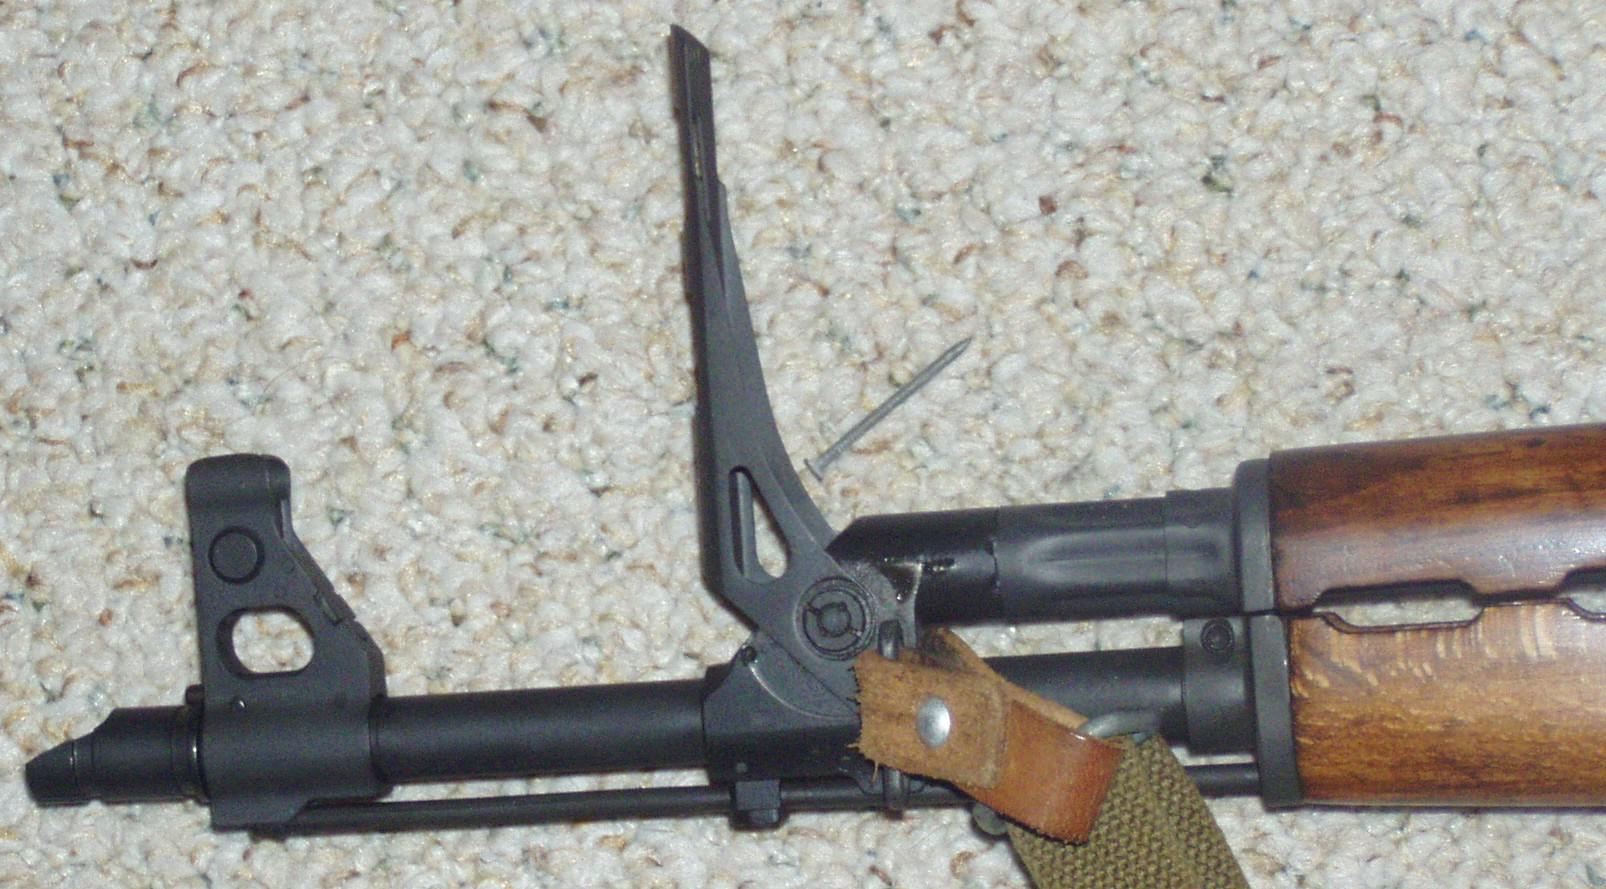 Kragujevac Grenade Images - Reverse Search